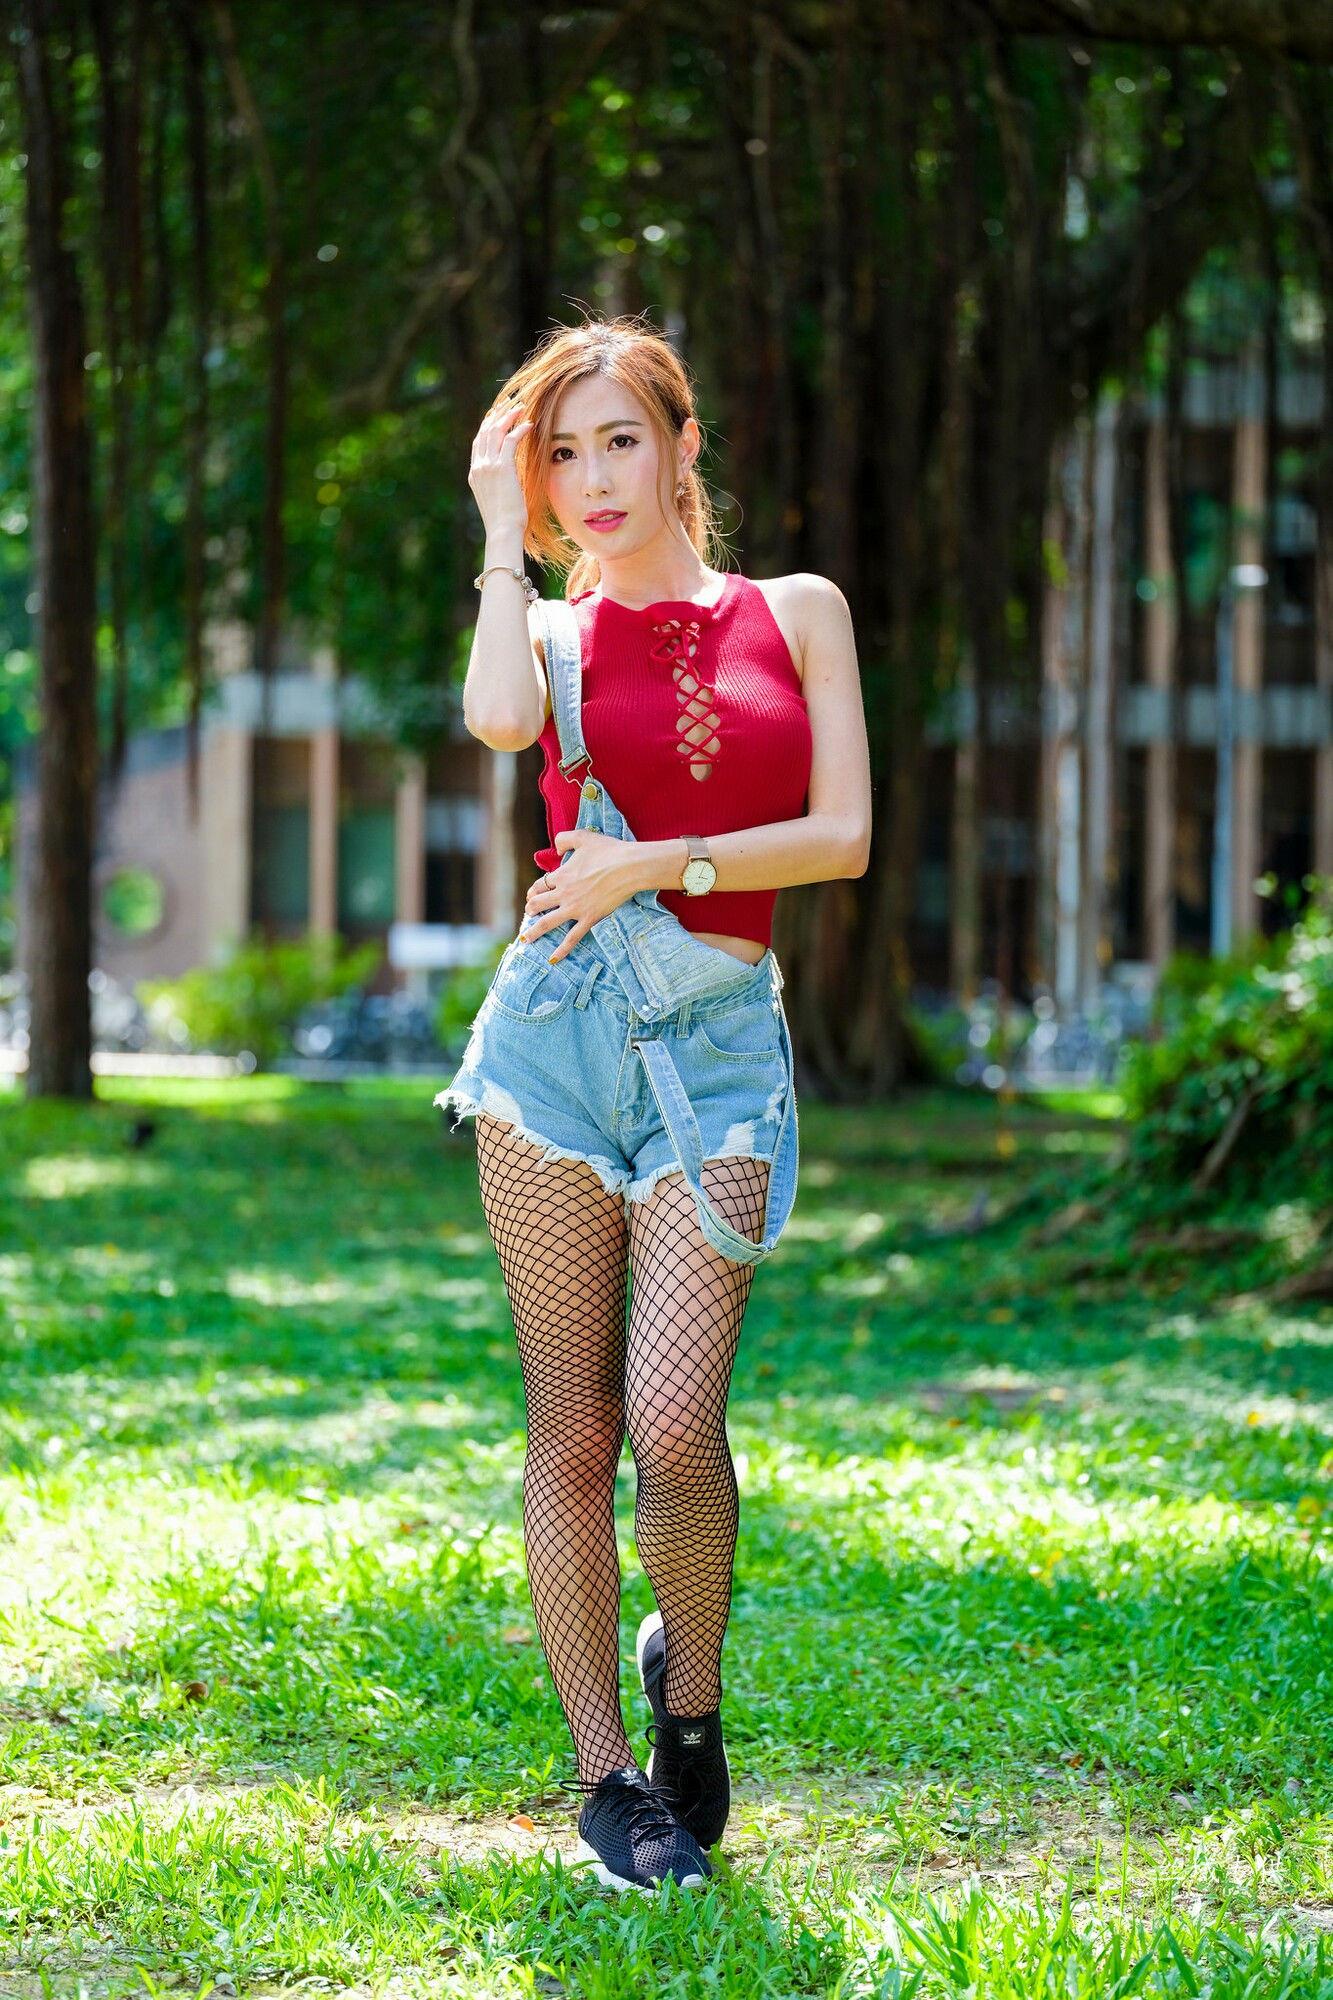 VOL.160 [台湾正妹]牛仔网袜街拍美腿:黄艾比(腿模Abbie)超高清个人性感漂亮大图(85P)